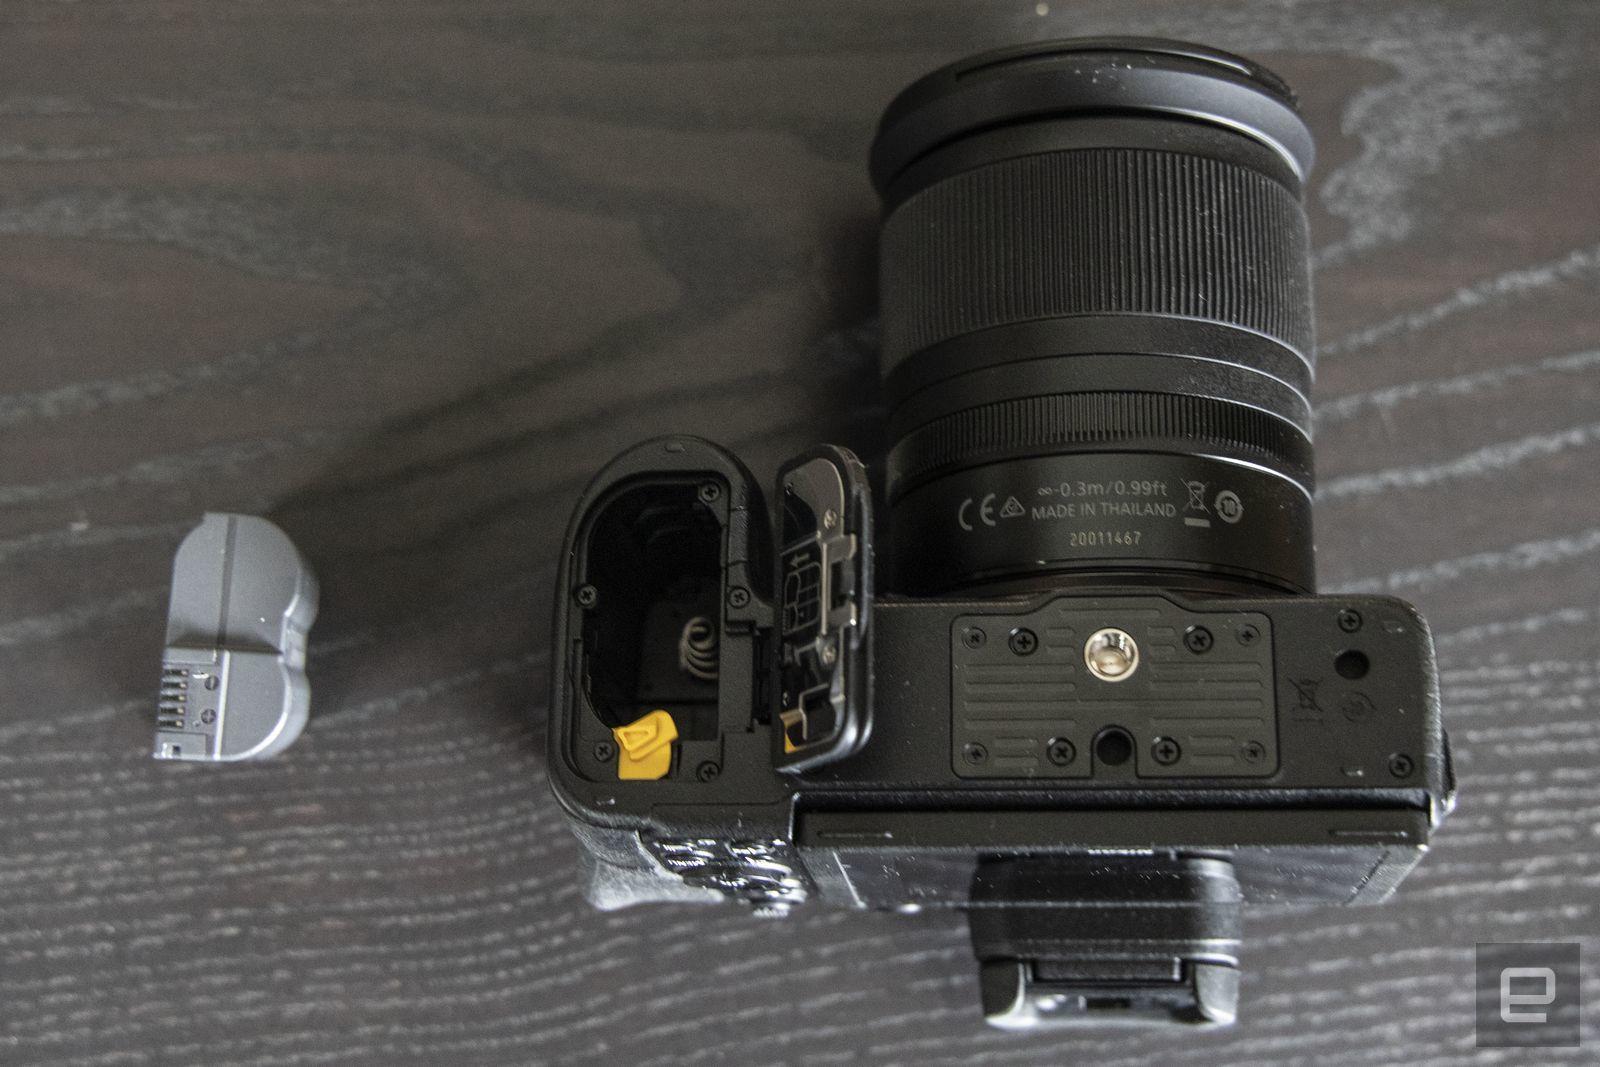 nikon-z7-full-frame-mirrorless-camera-13